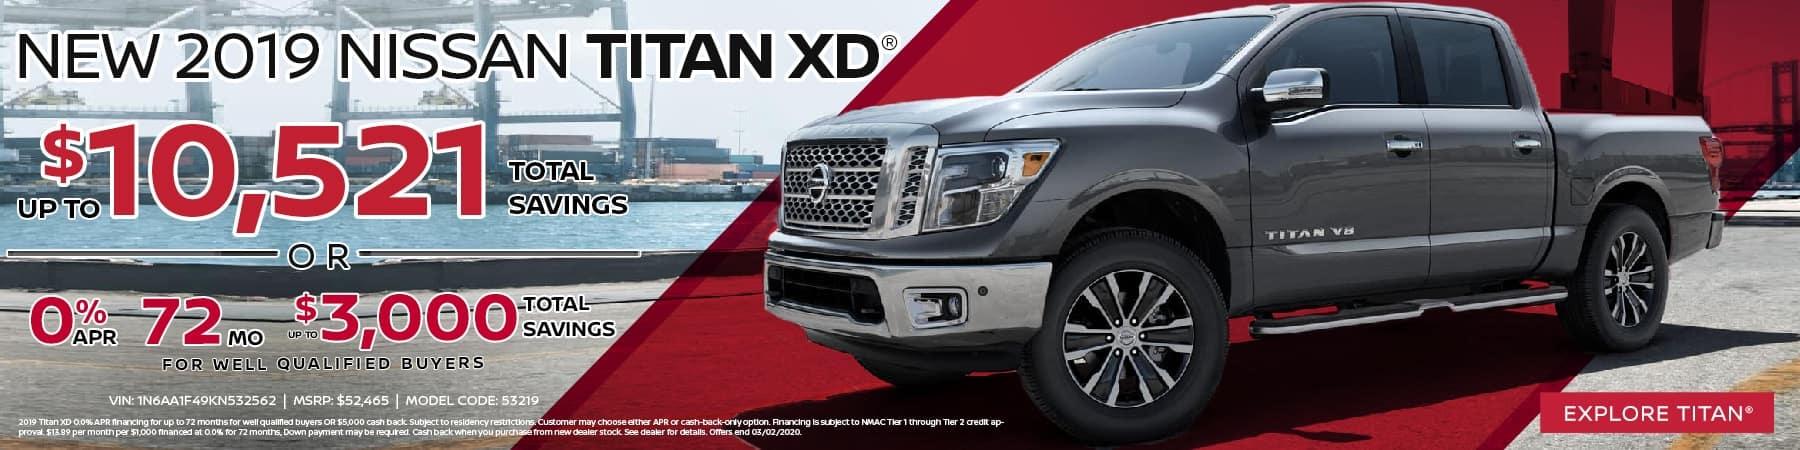 New 2019 Nissan Titan XD